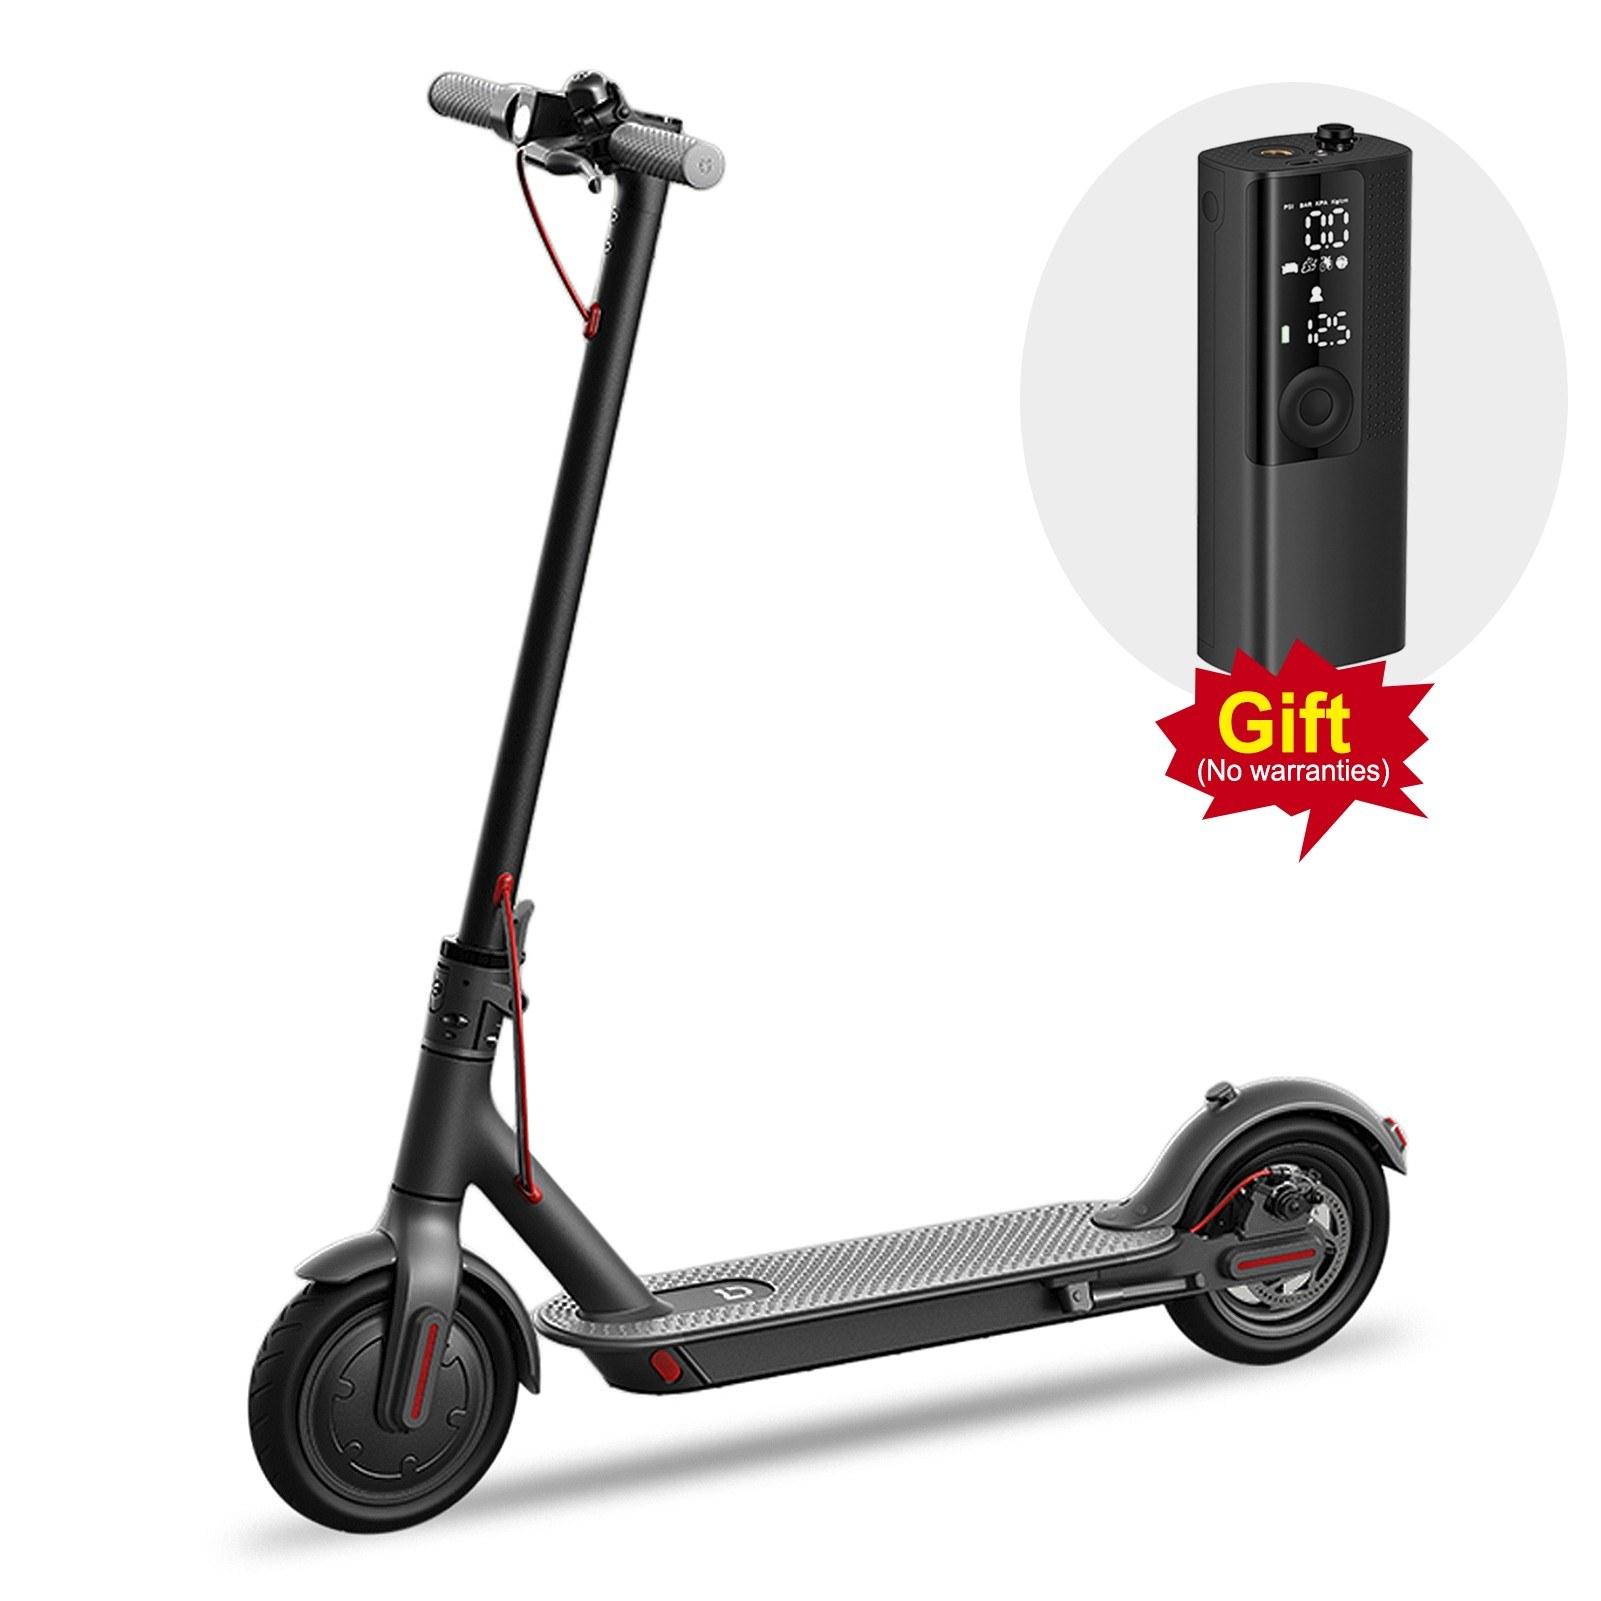 Tomtop - [EU Warehouse] Xiaomi Mijia 1S 8.5 Inch Folding Electric Scooter 30km Range App Connection, $359.99 (Inclusive of VAT)